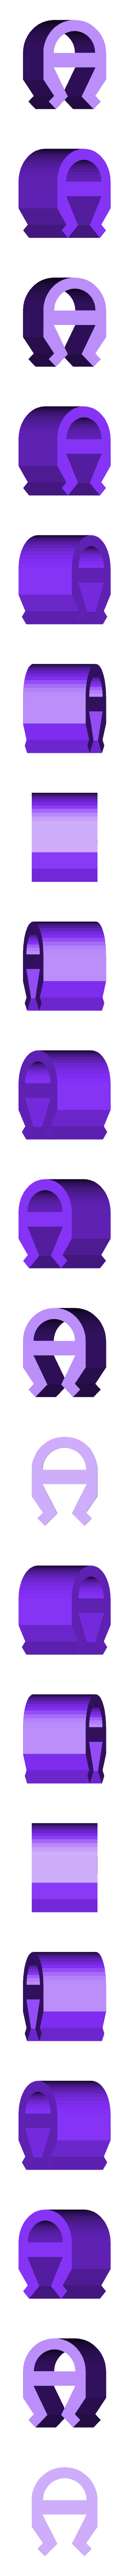 ZipClip Parallel.stl Download free STL file V-Slot Zip-Tie Clip • 3D printing design, greaseandmetal